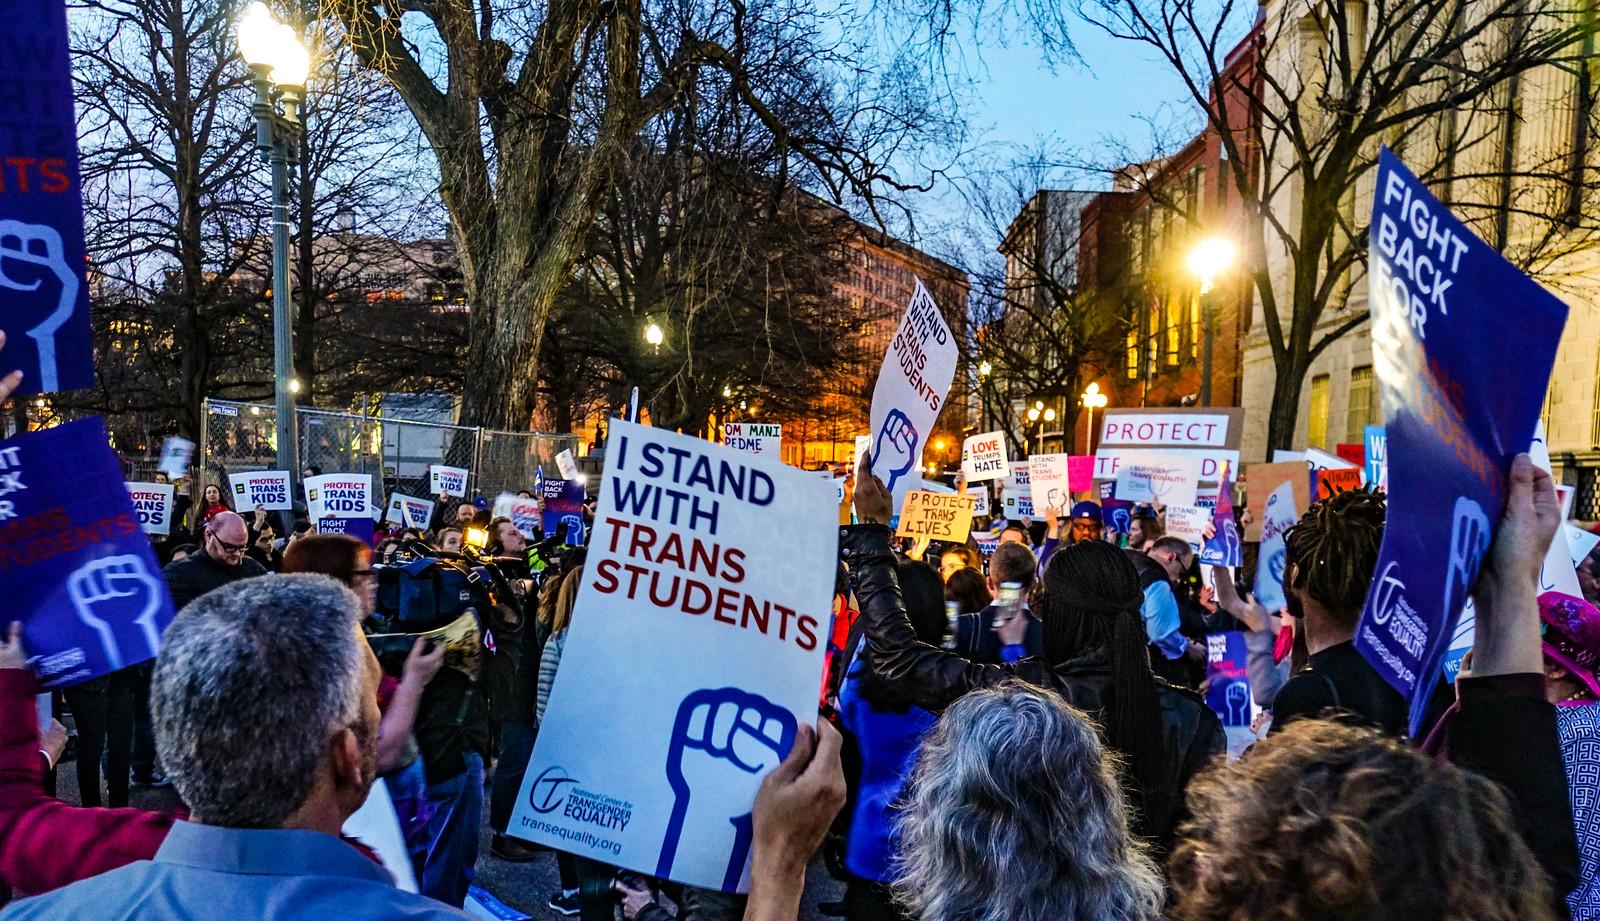 2017.02.22 ProtectTransKids Protest, Washington, DC USA 01092